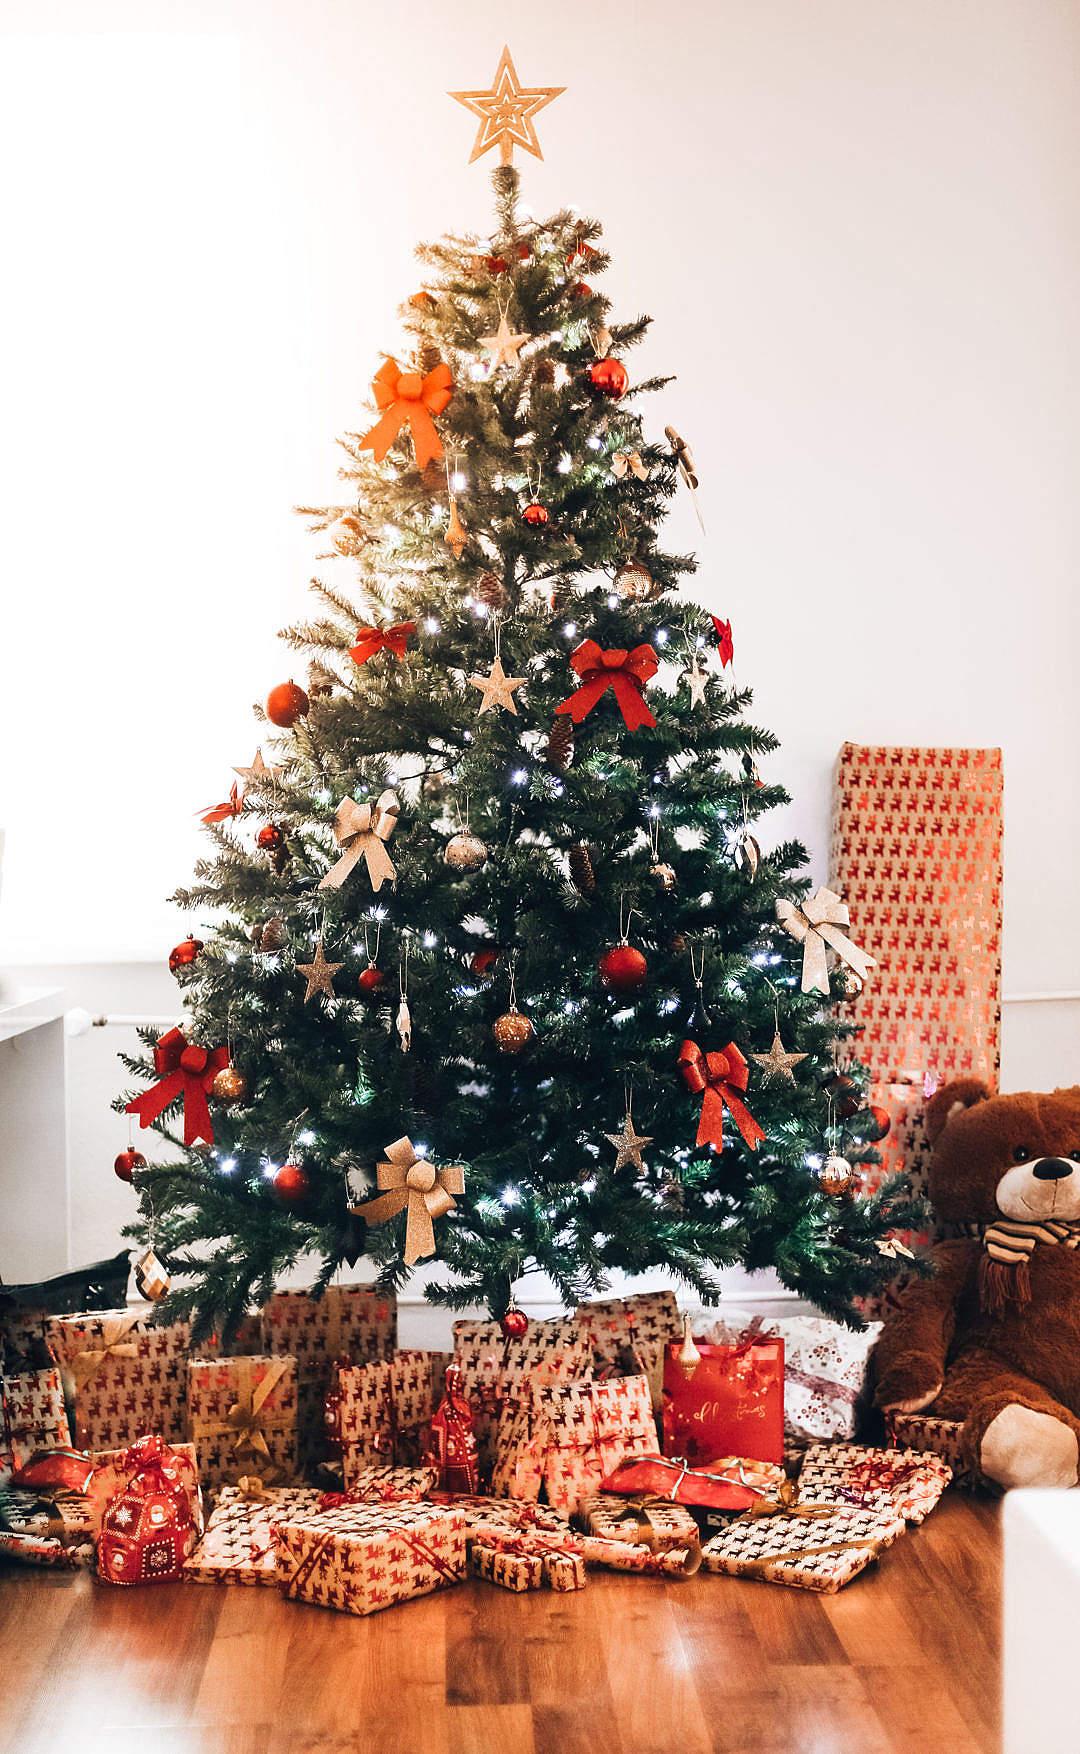 Download Christmas Tree FREE Stock Photo